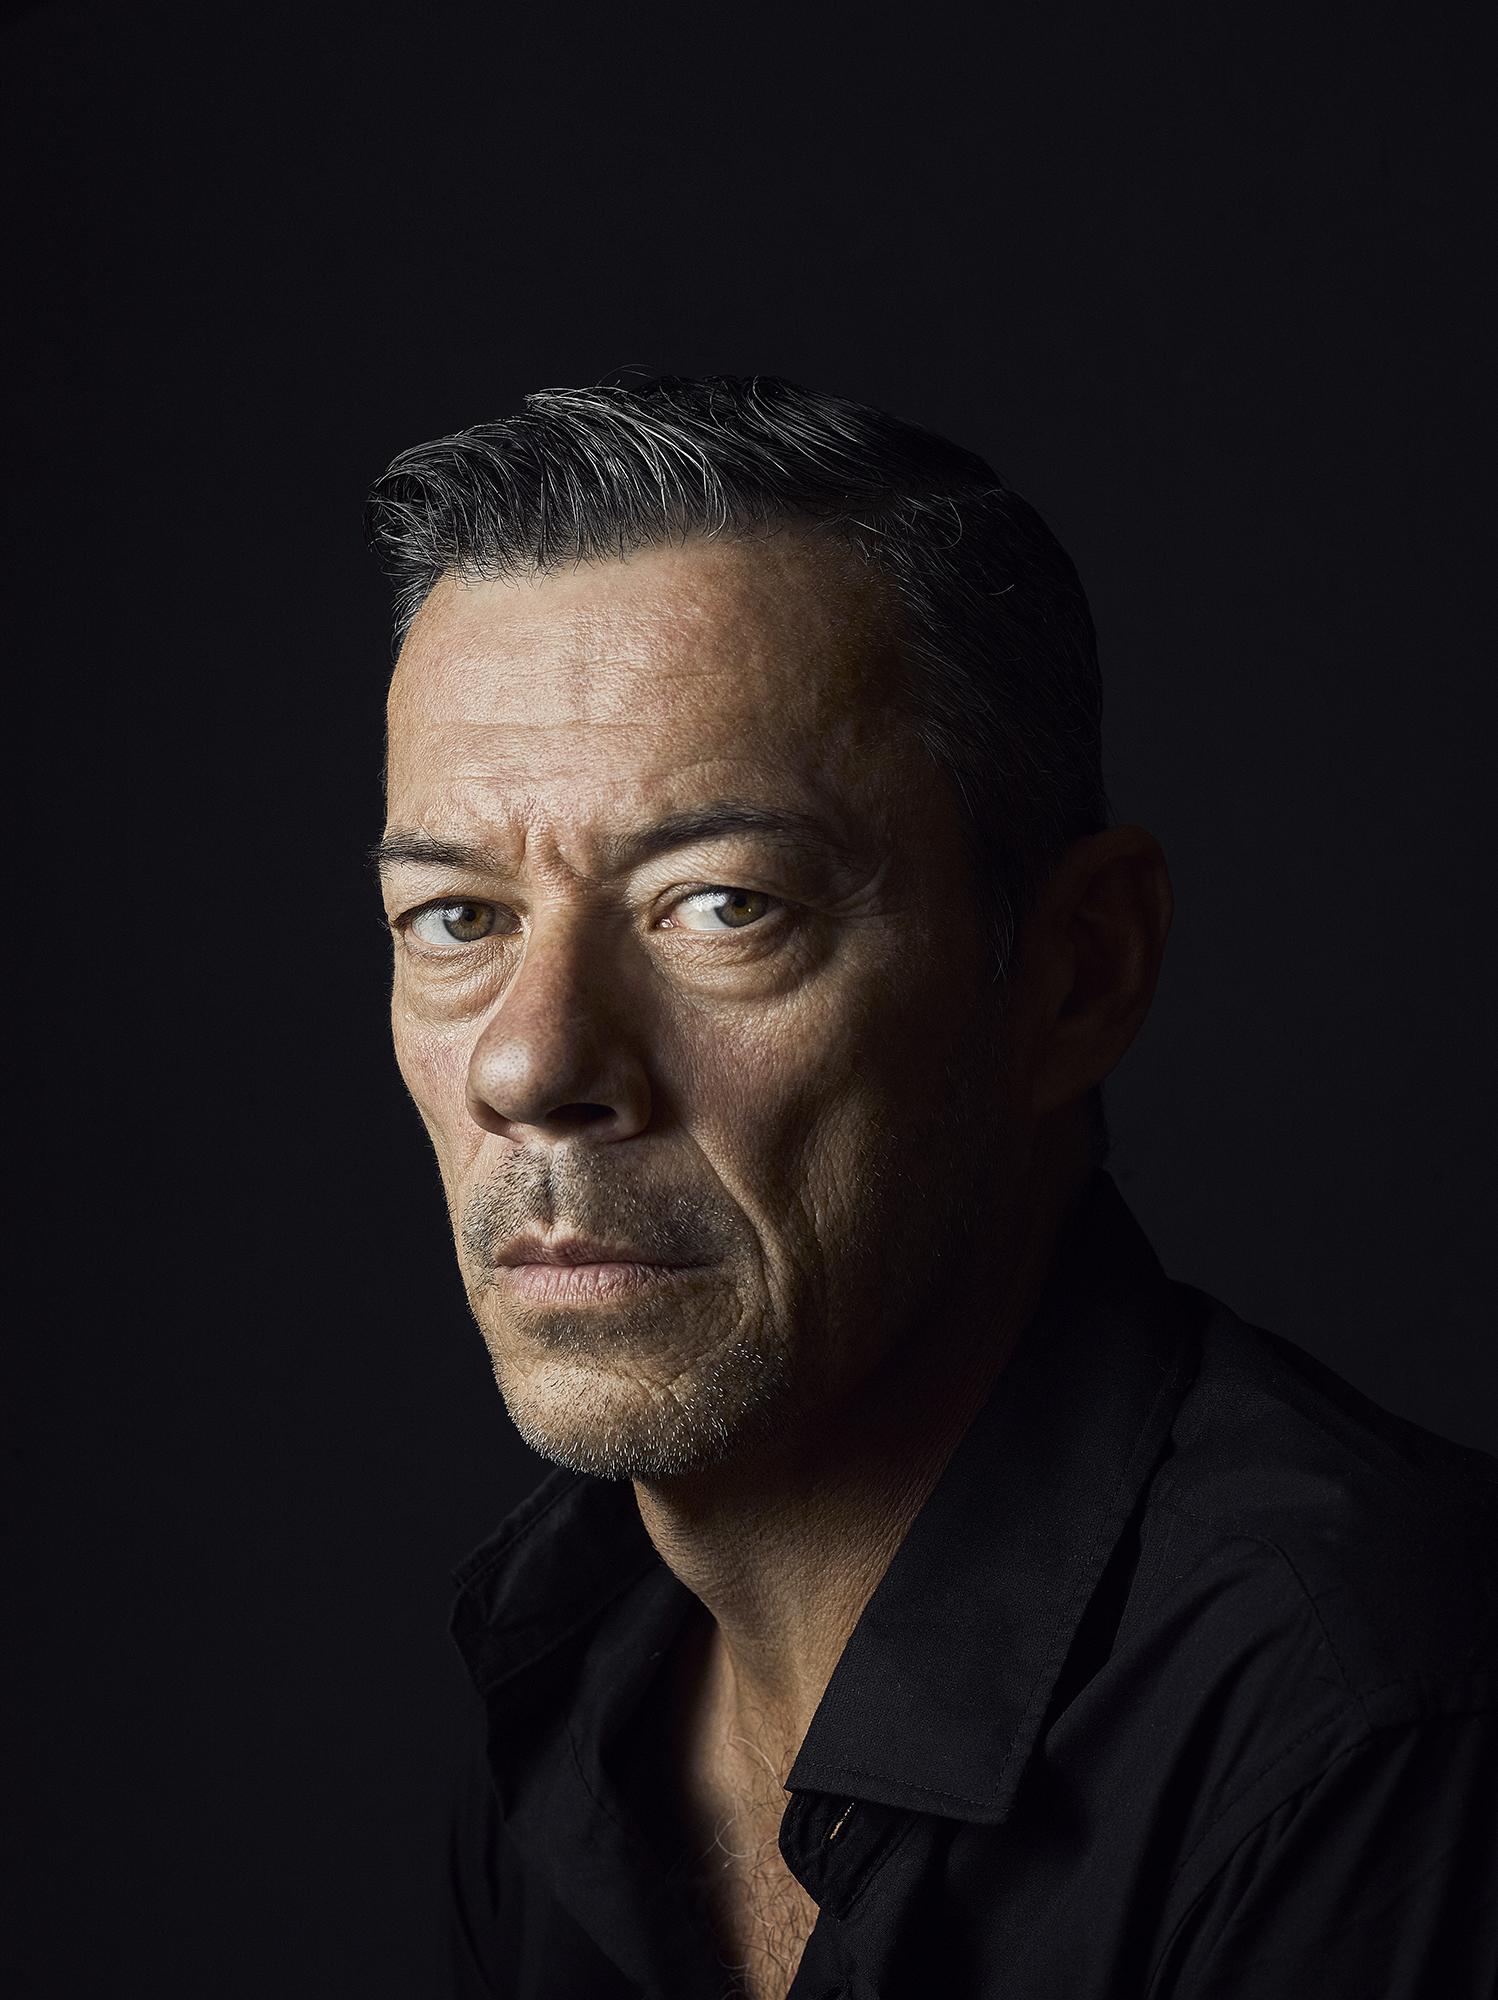 Massi Furlan Actors Headshots Los Angeles Rory Lewis Photographer